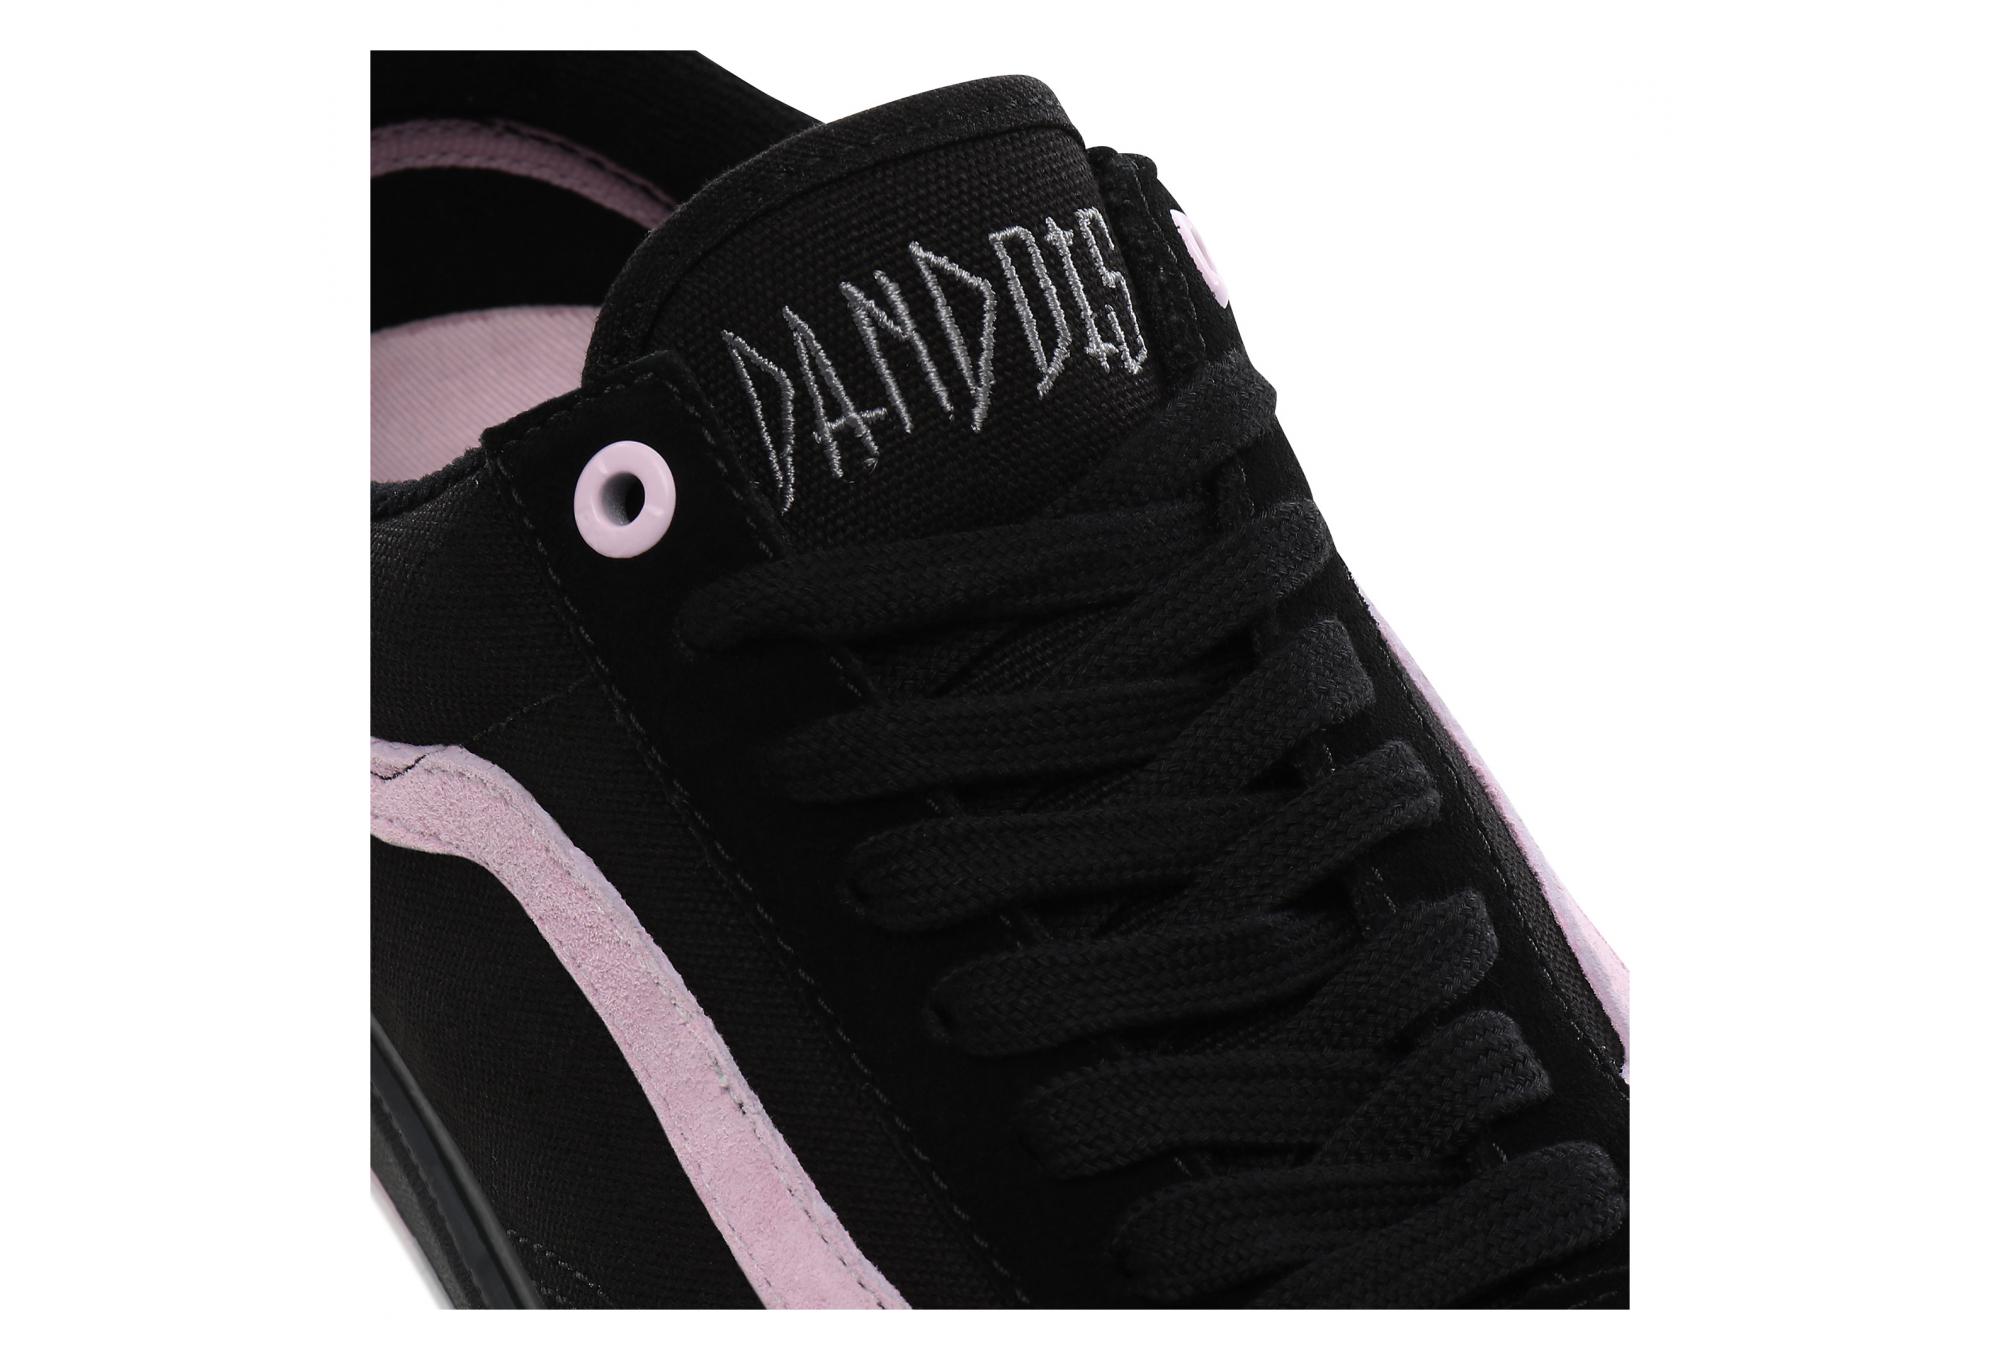 Vans Old Skool Pro BMX Shoes Matthias Dandois Black Pink